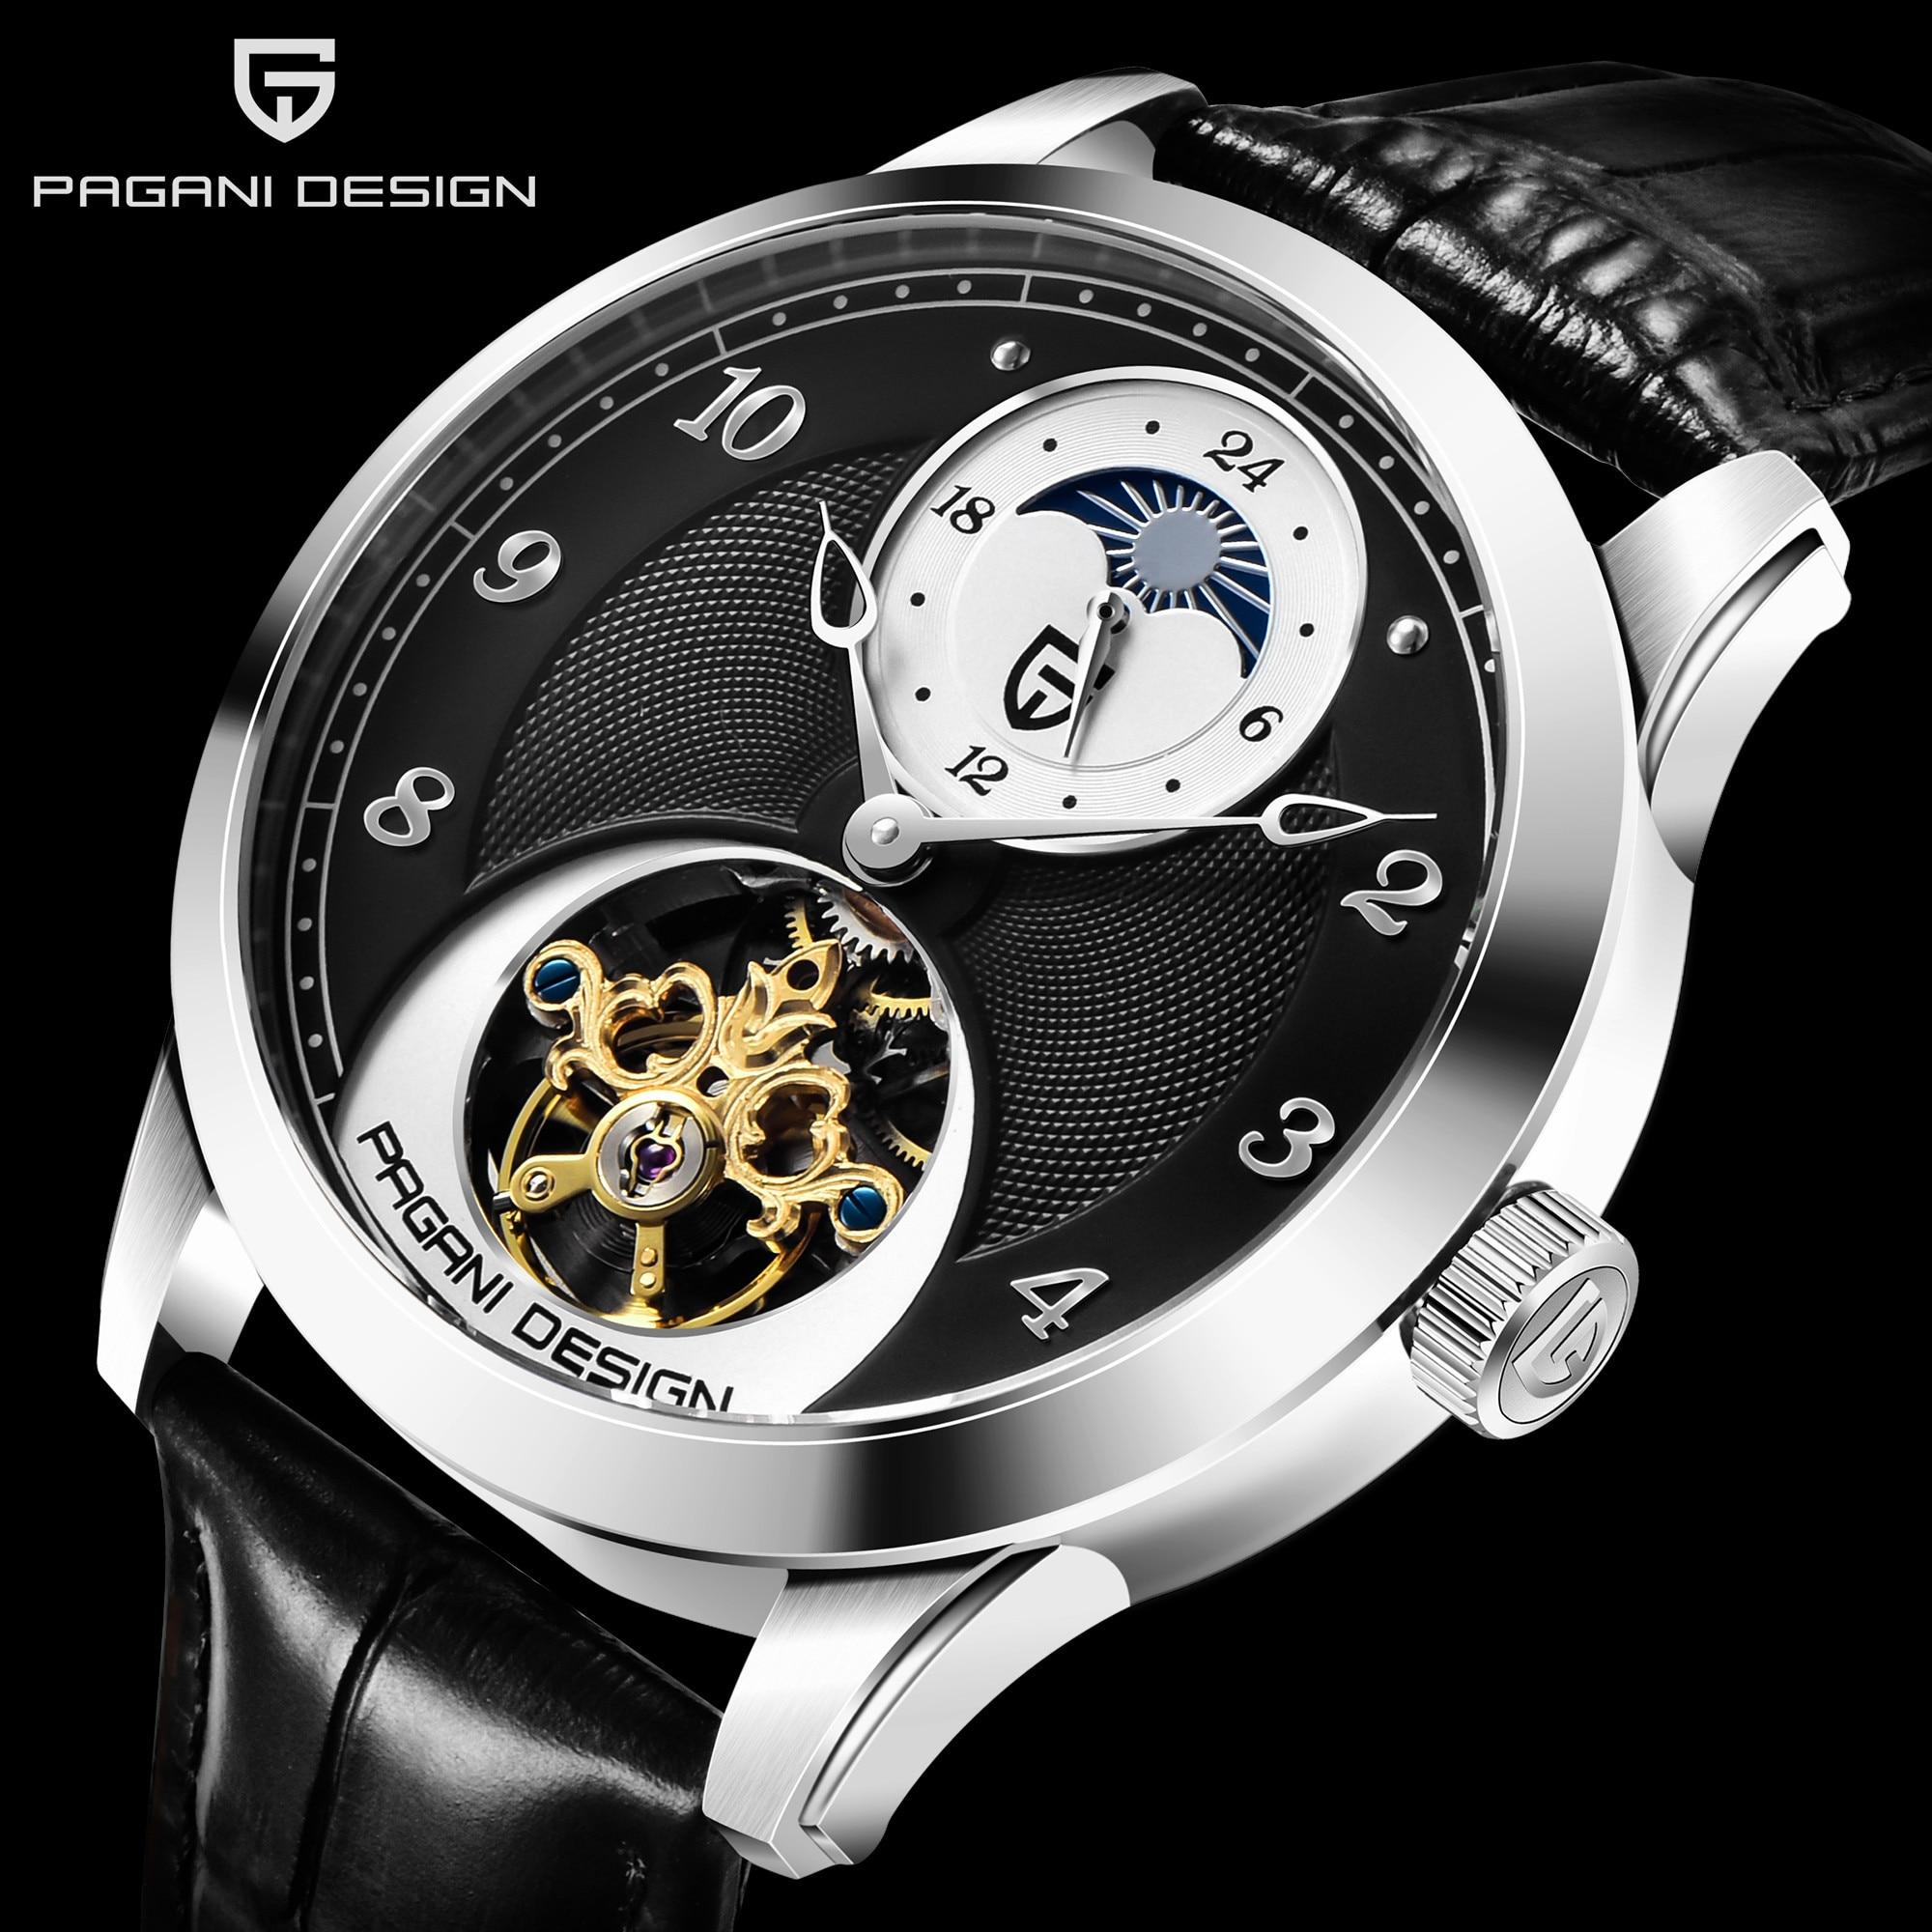 Men's Watches Luxury Brand PAGANI DESIGN Automatic Mechanical Watches Men Business Waterproof Gold Wrist Watch Relogio Masculino